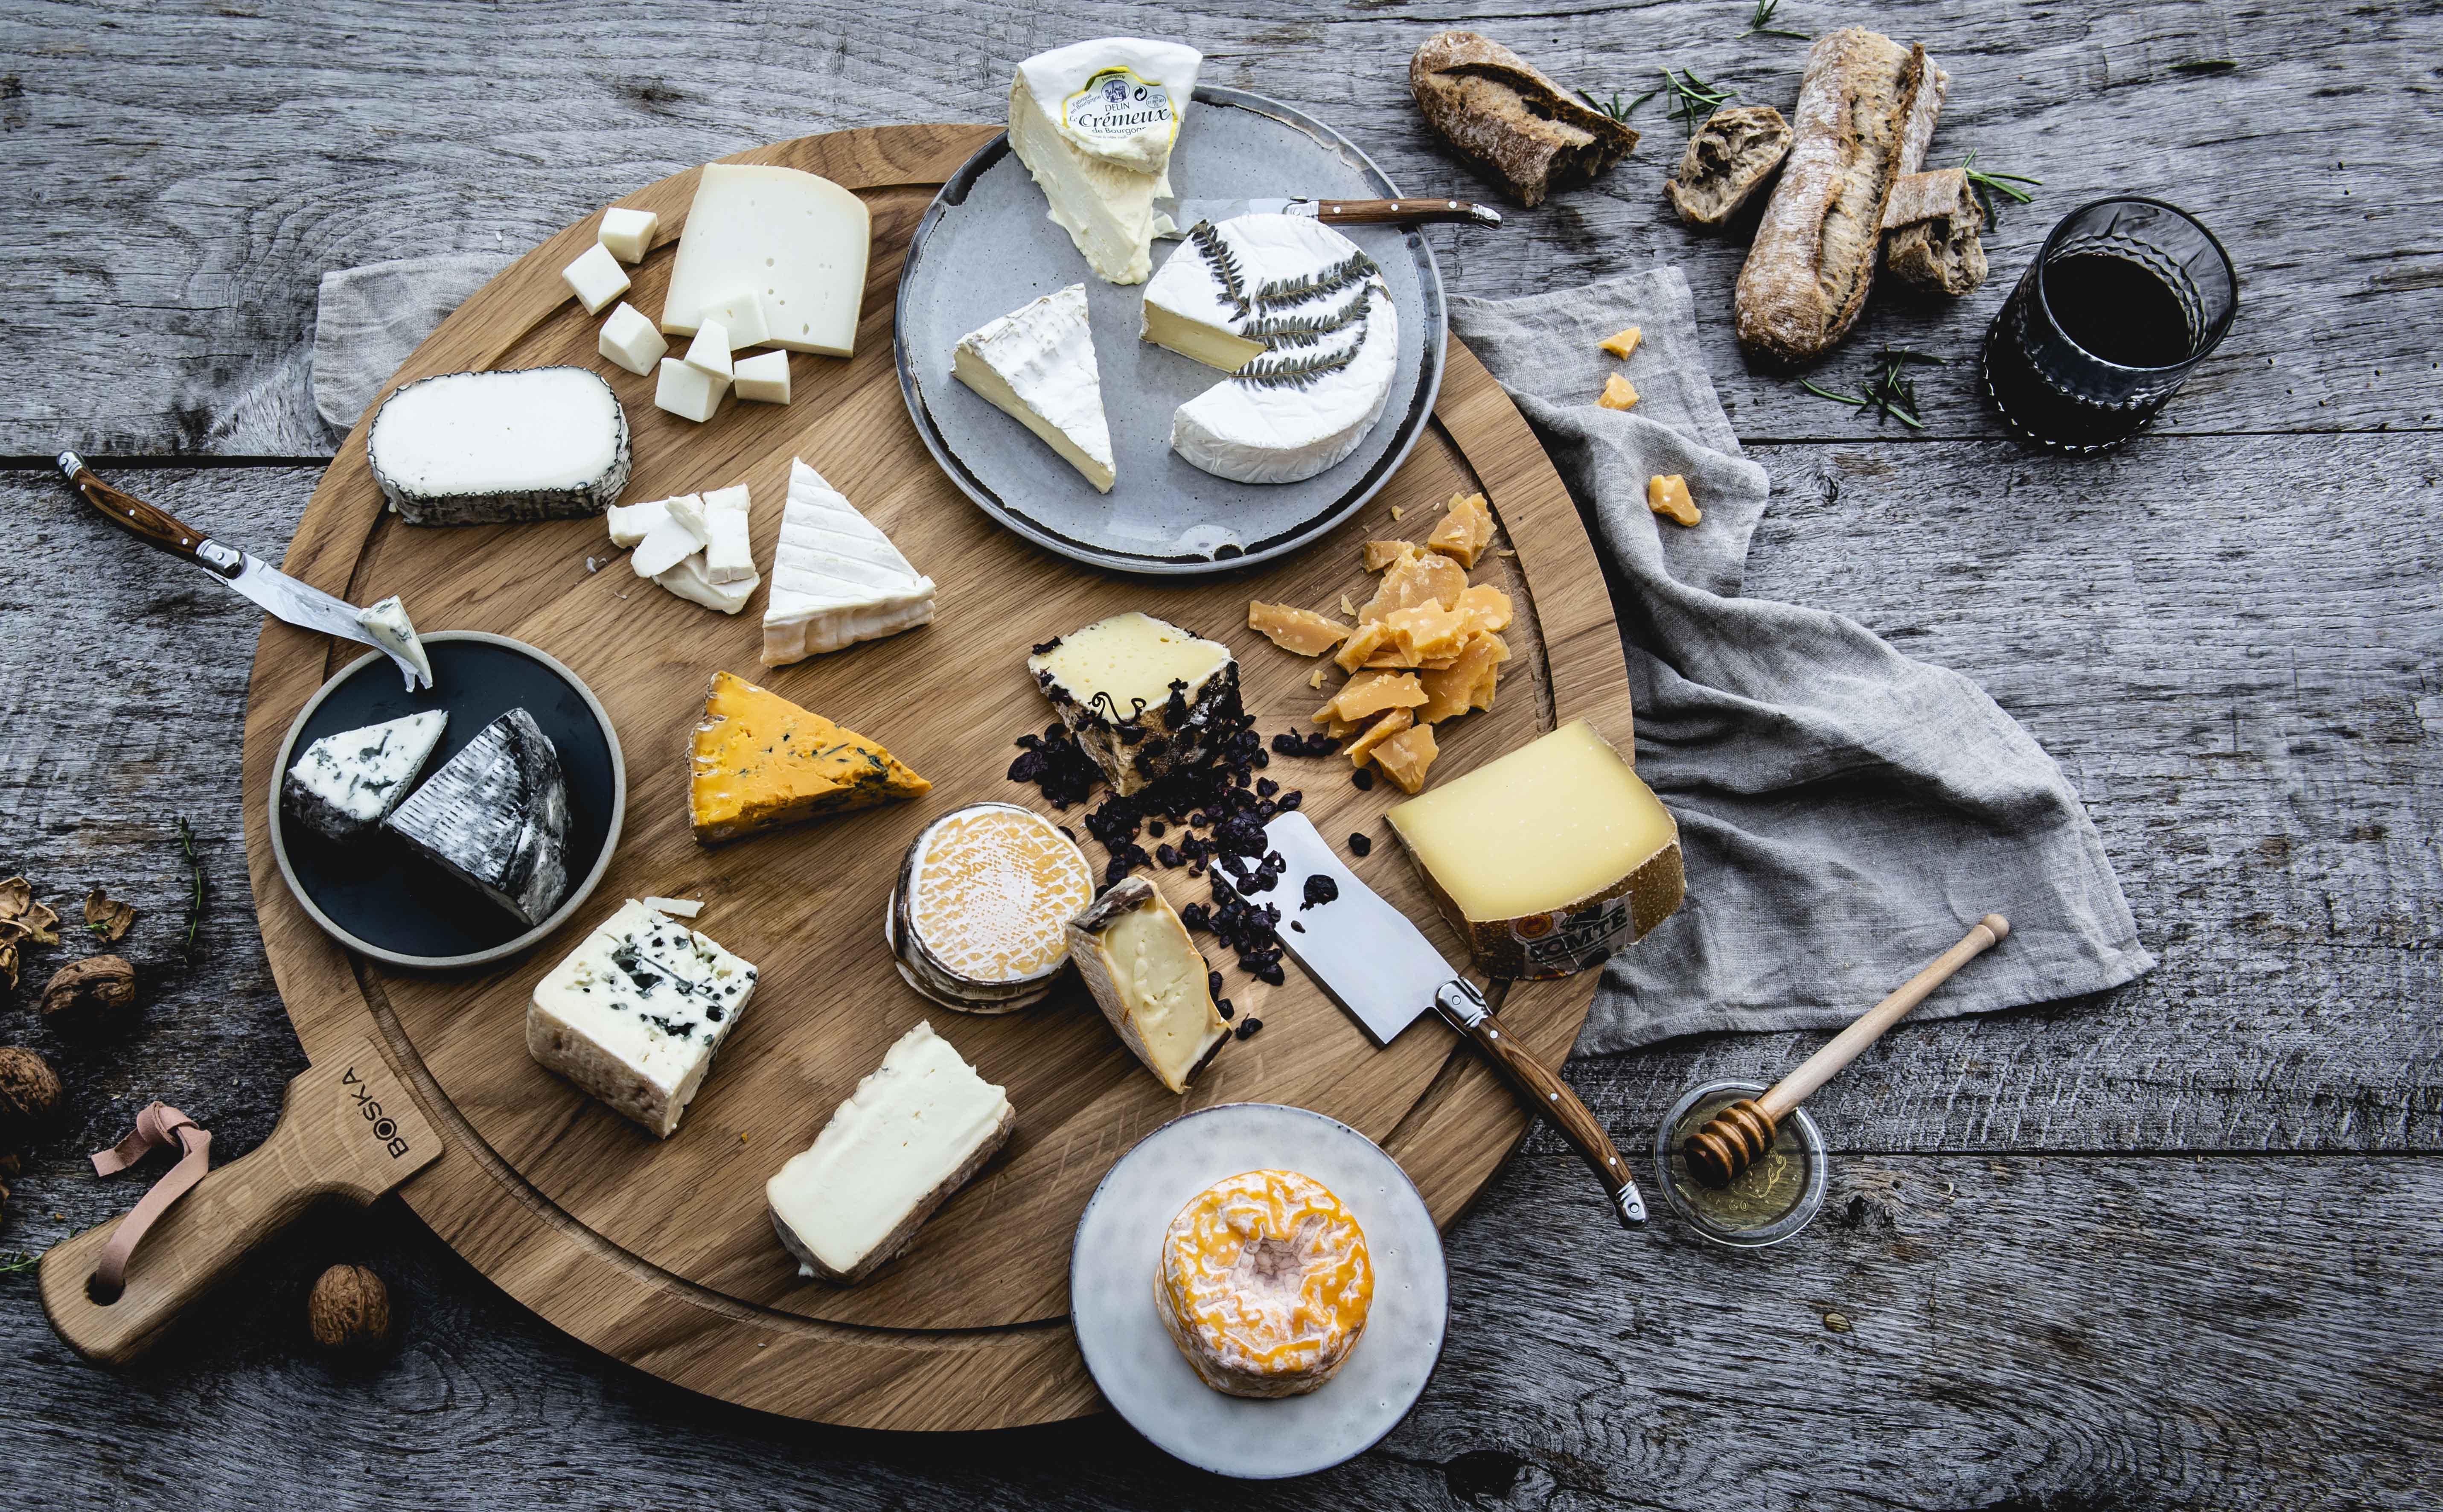 Zuivelhoeve Stefanie Spoelder Food Photography Cheeseplattern Kaasplank klein-1